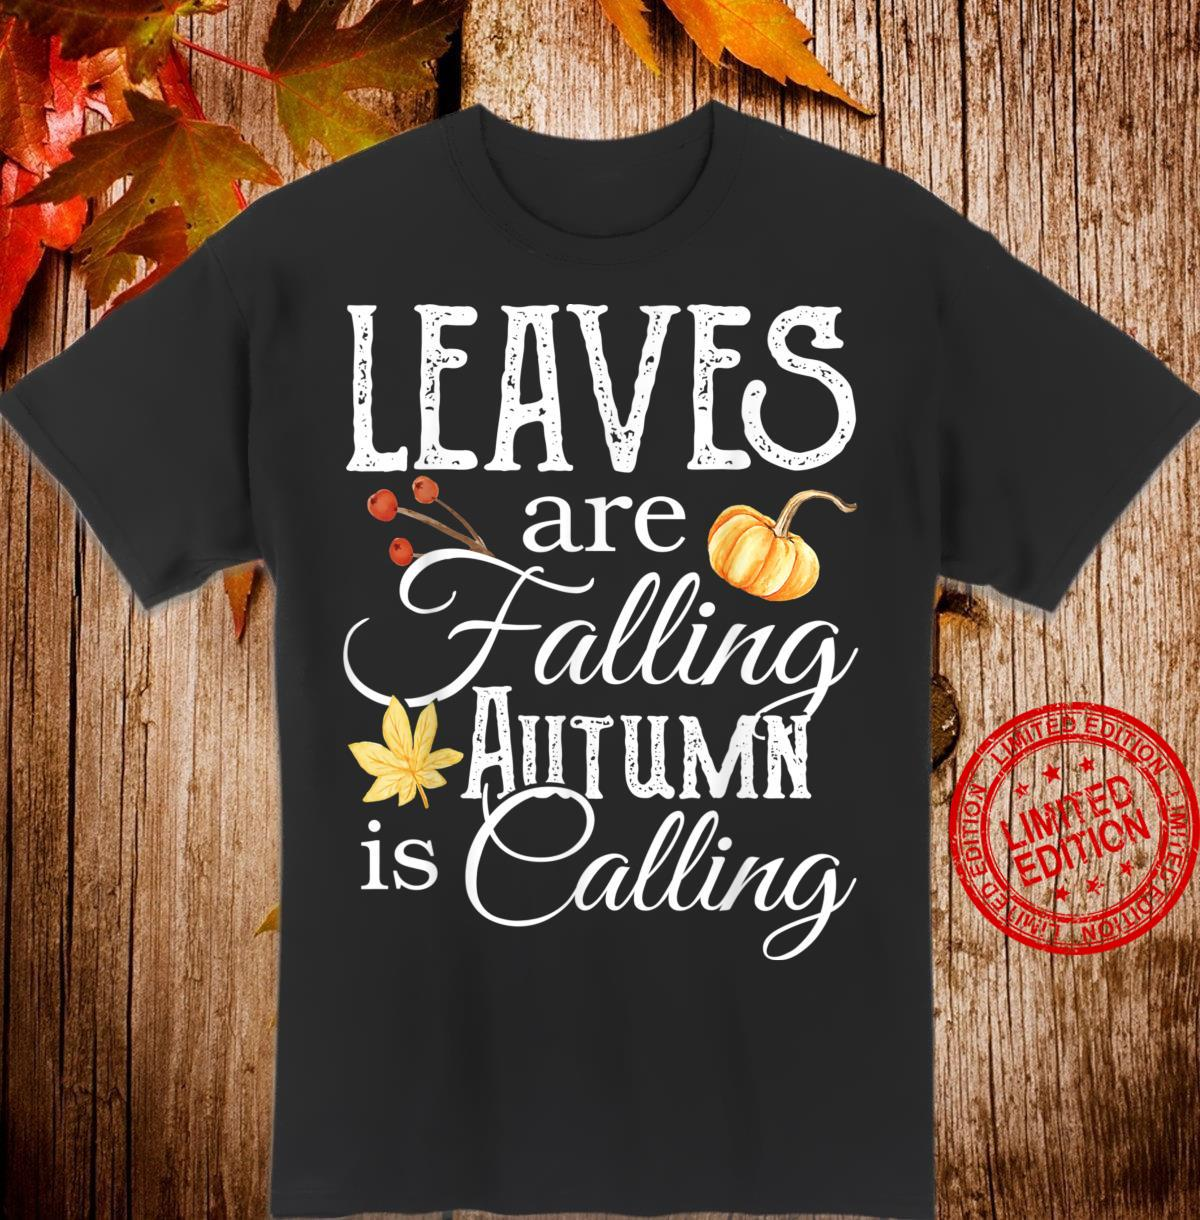 Leaves are Falling Autumn is Calling Shirt,Hello Pumpkin Shirt